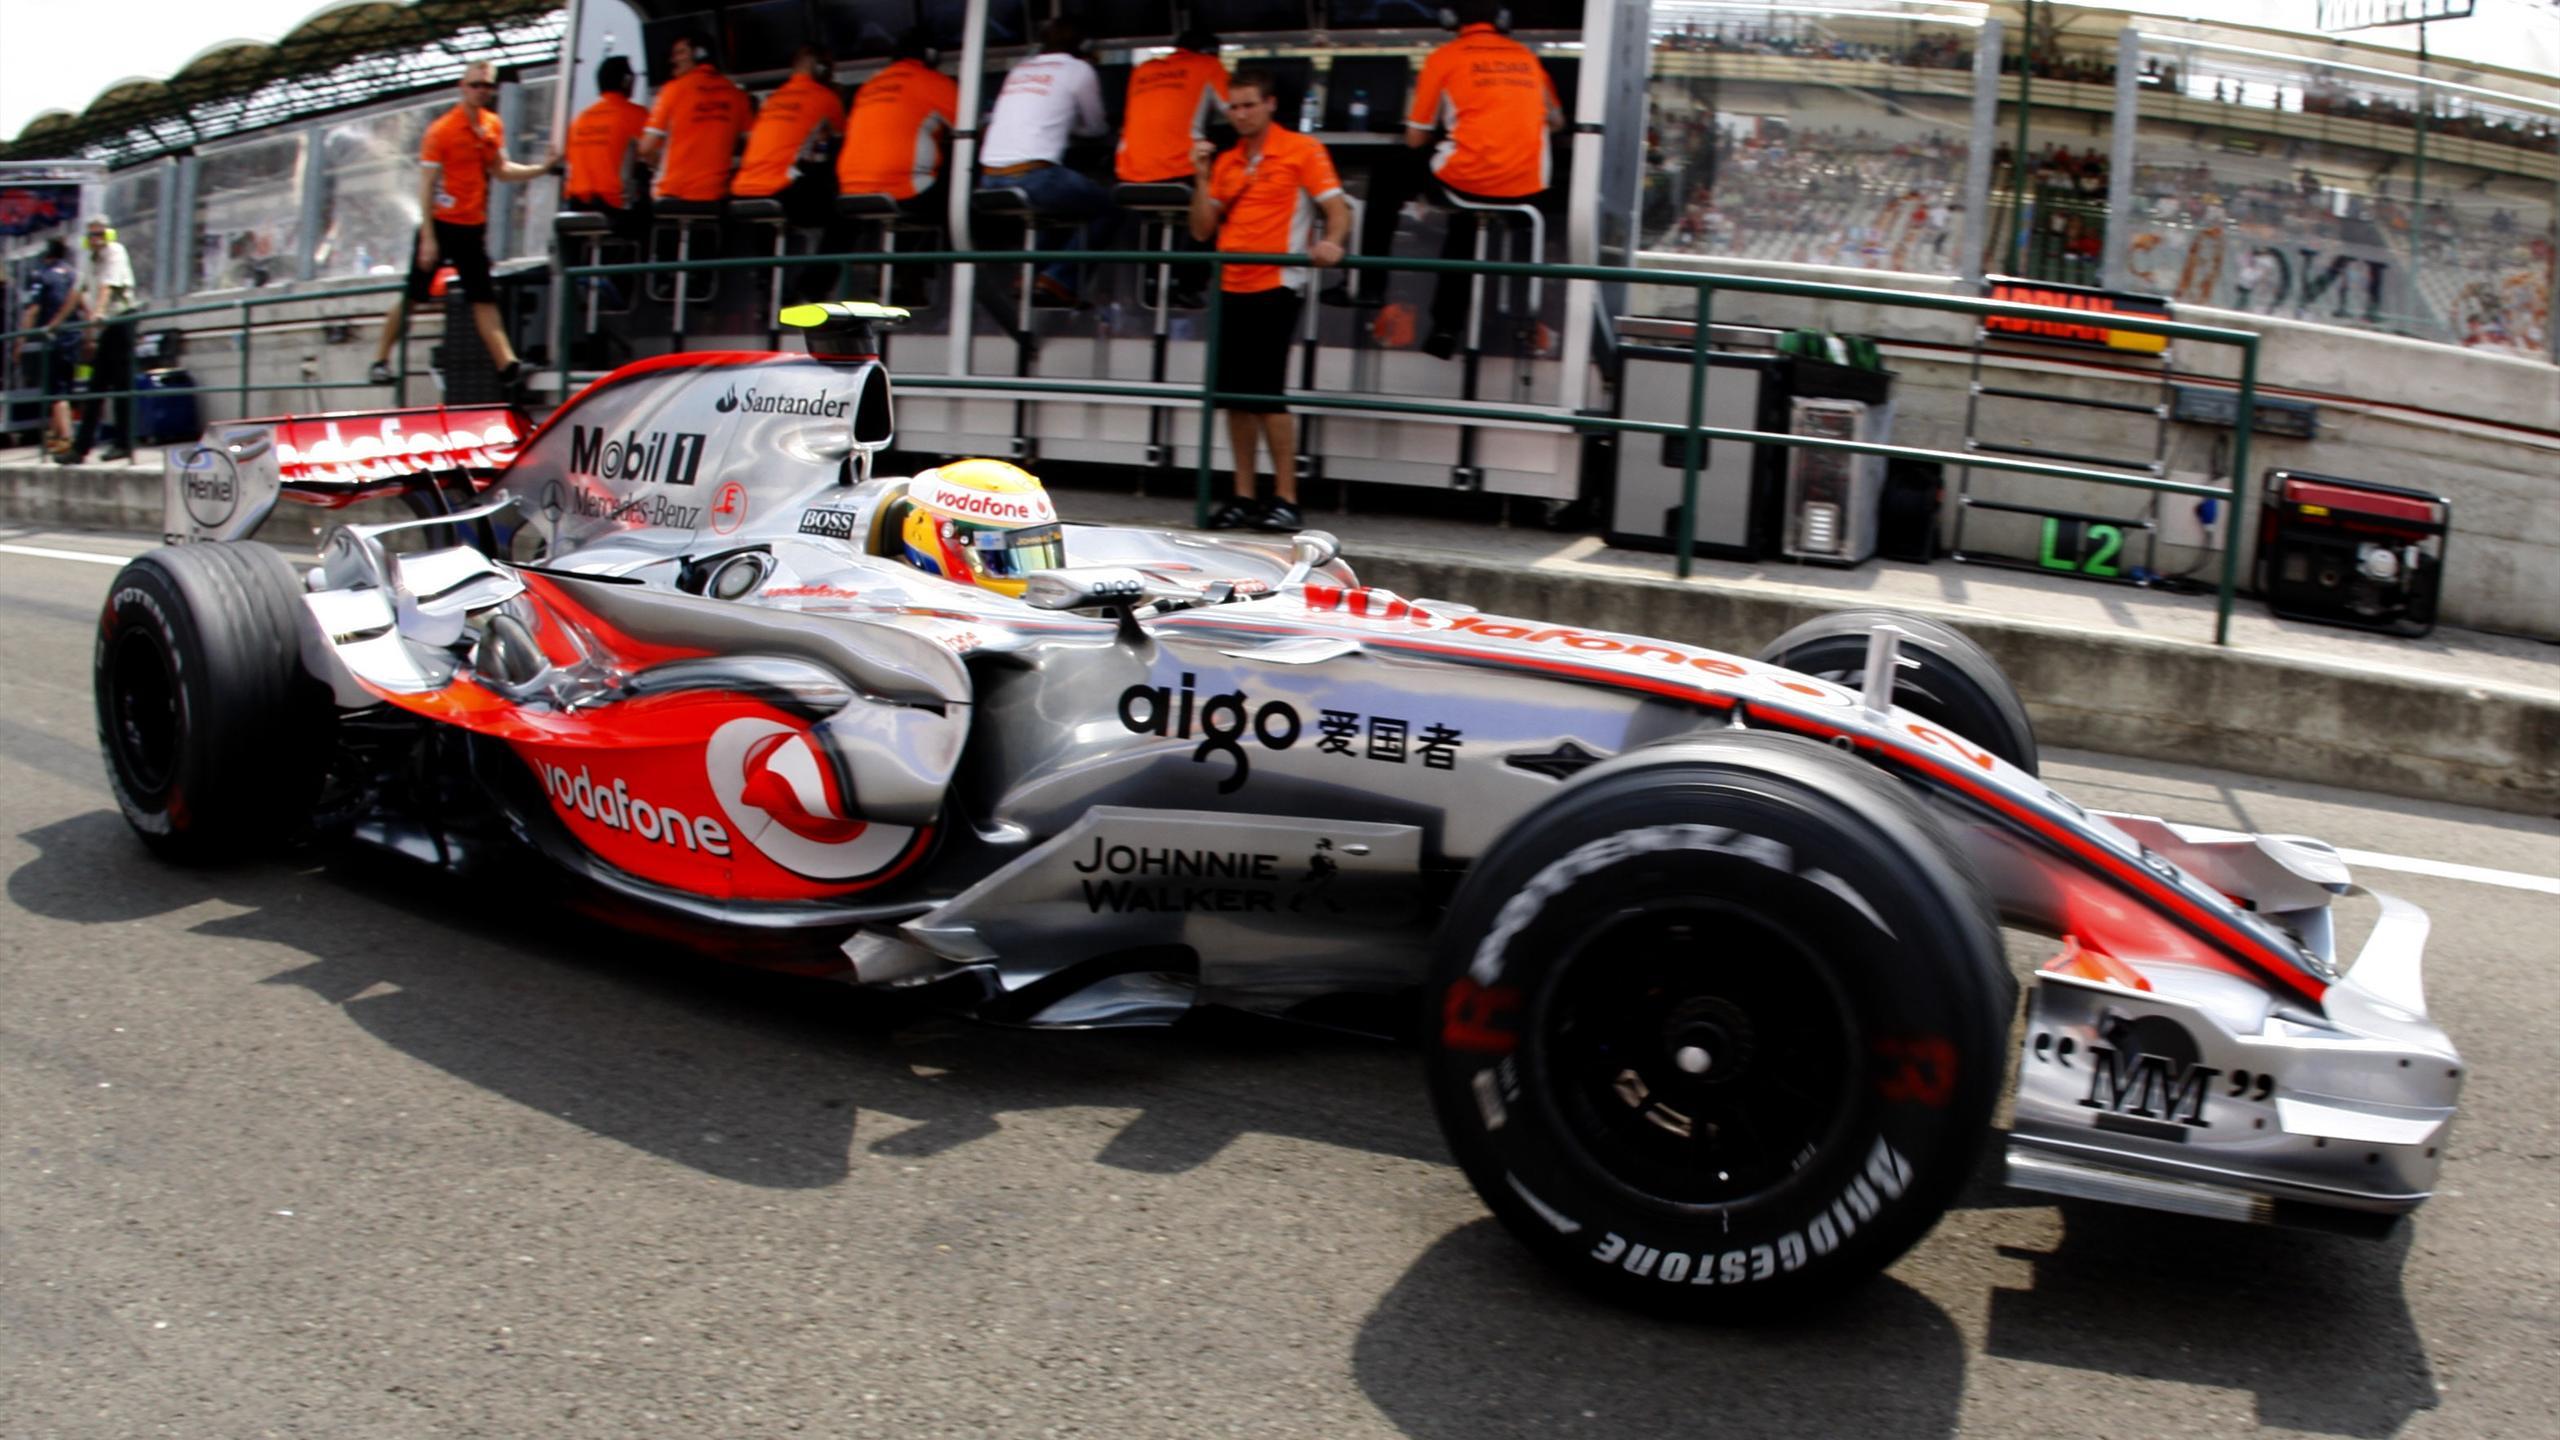 Lewis Hamilton (Mclaren) au Grand Prix de Hongrie 2007